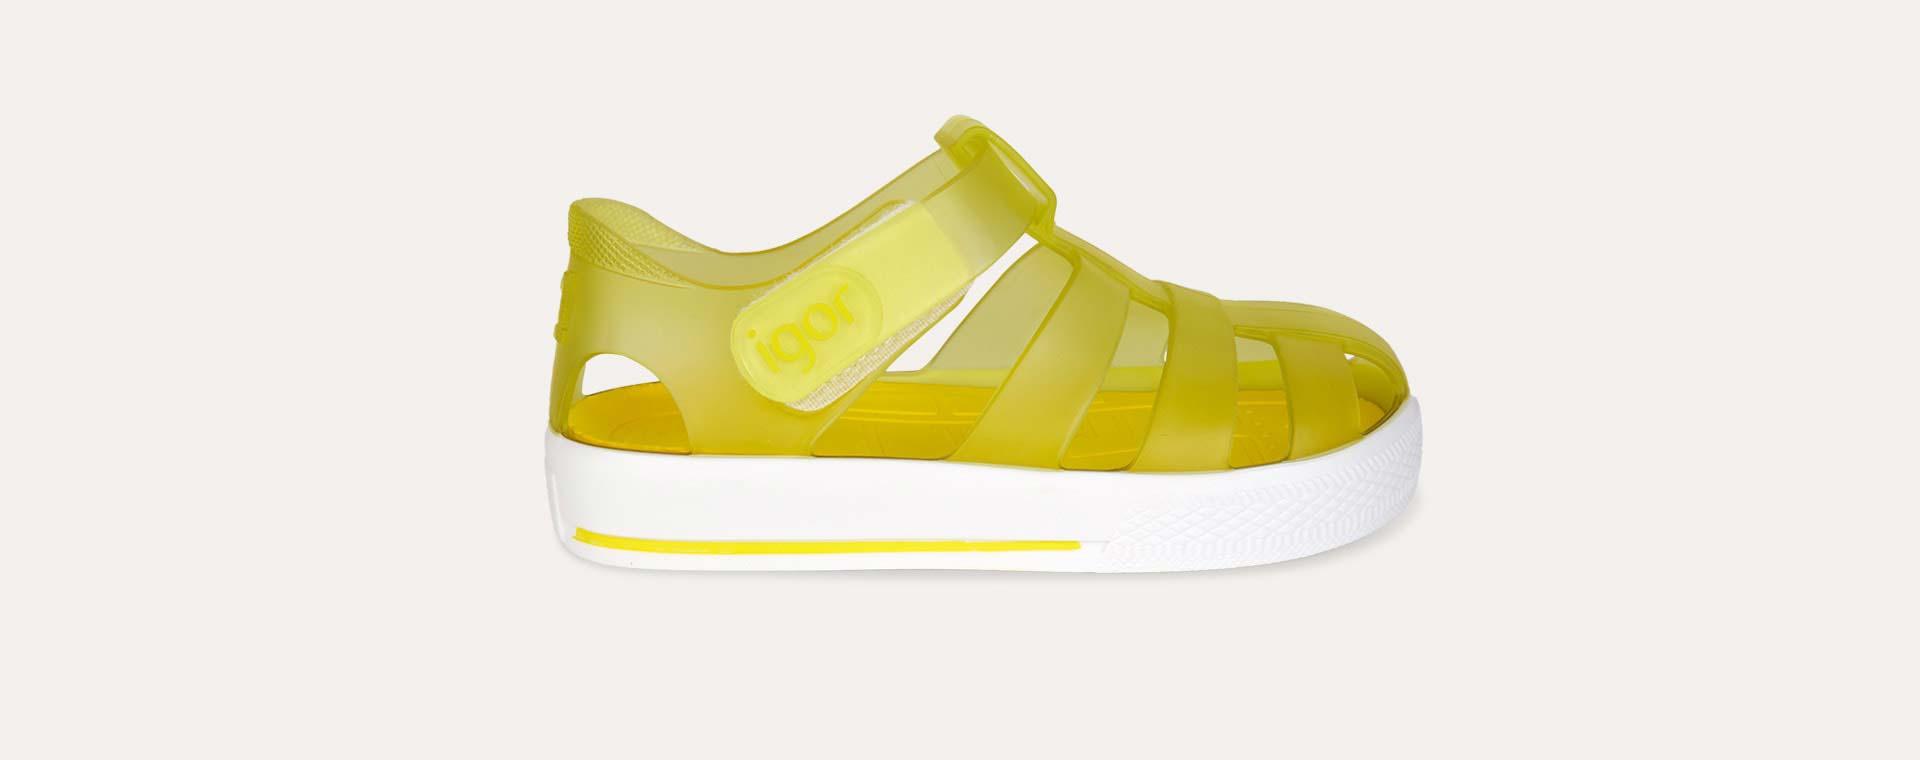 Amarillo igor Star Velcro Jelly shoes